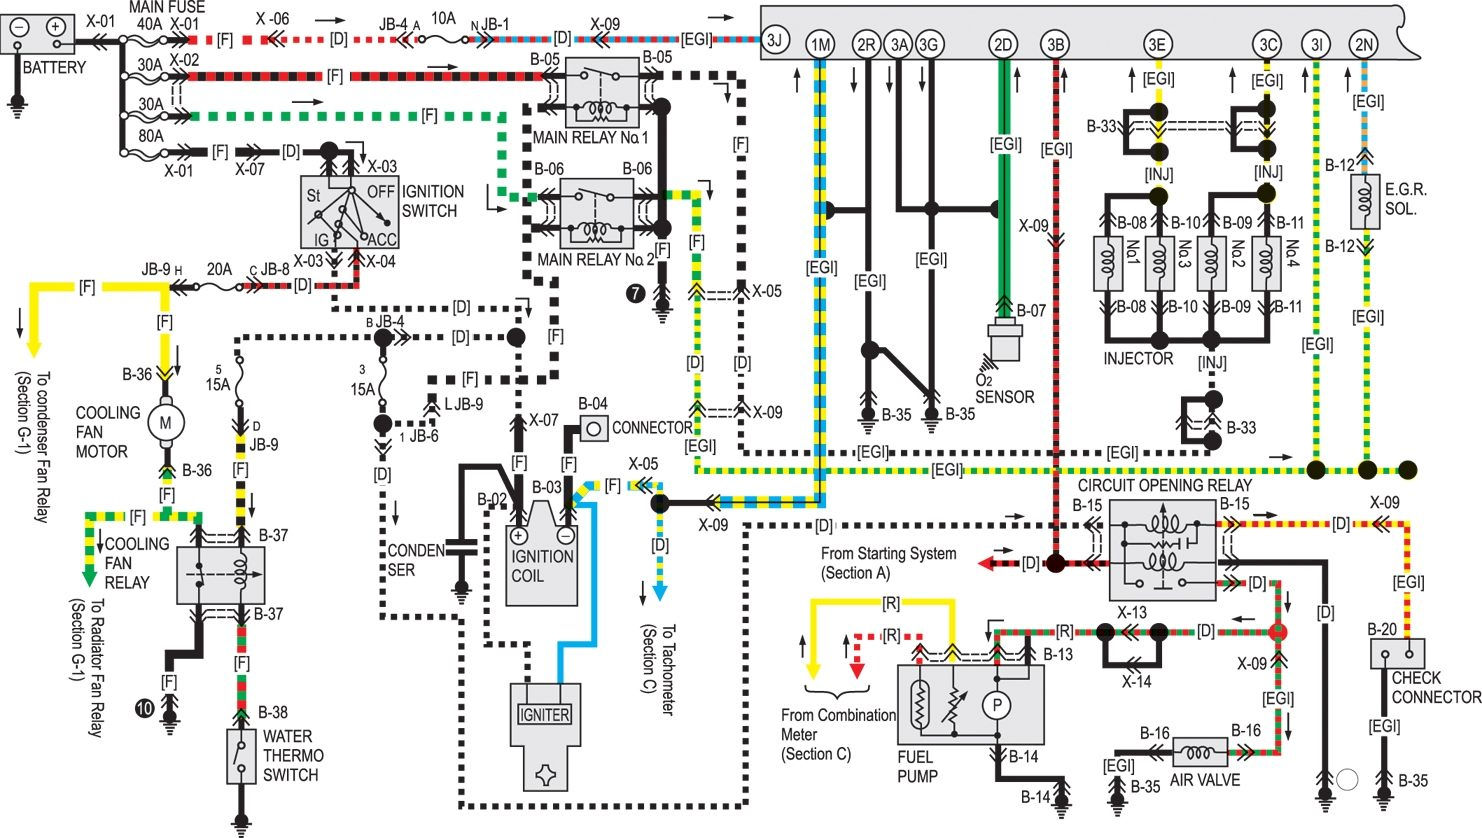 Mazda 323 Wiring Diagram Somurich com